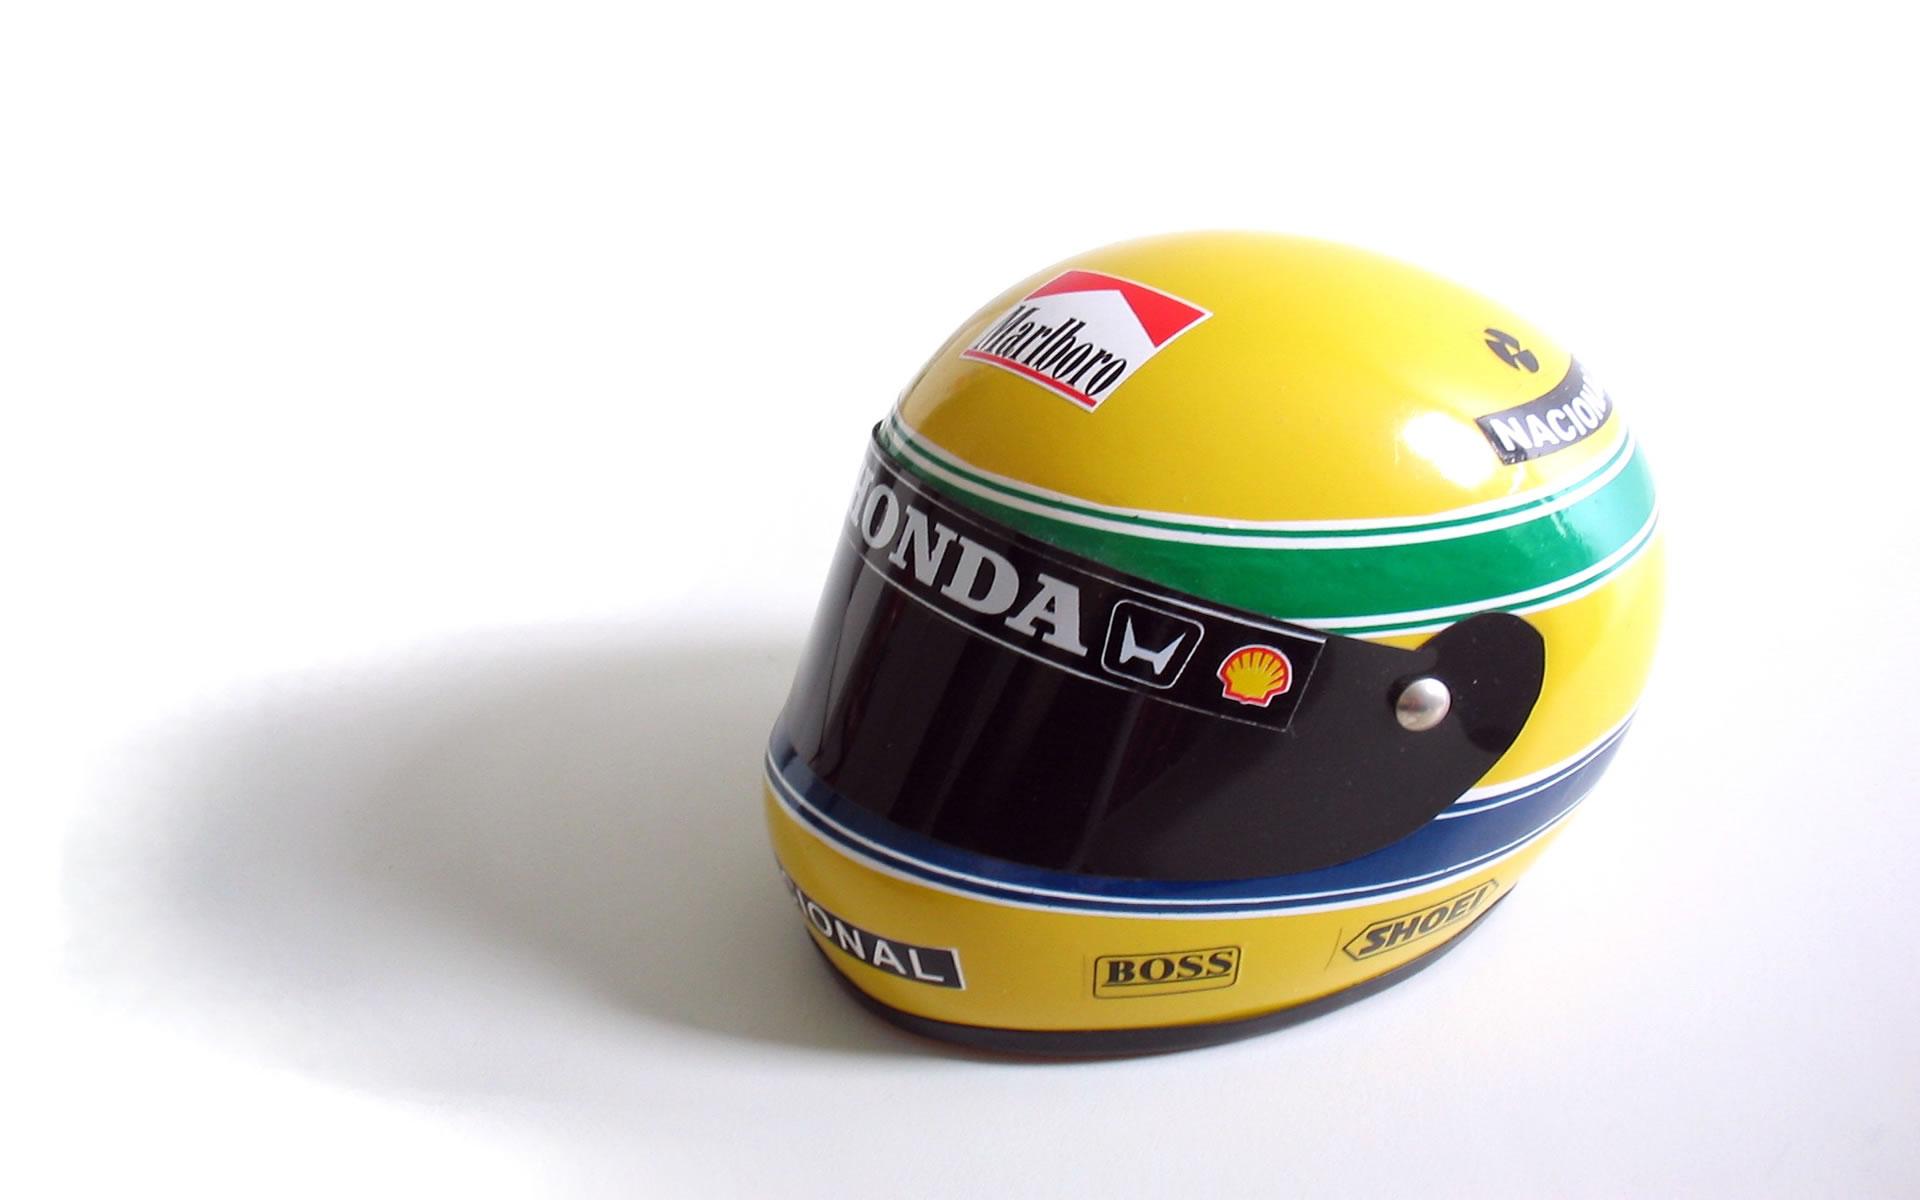 Wallpaper del Casco de Ayrton Senna